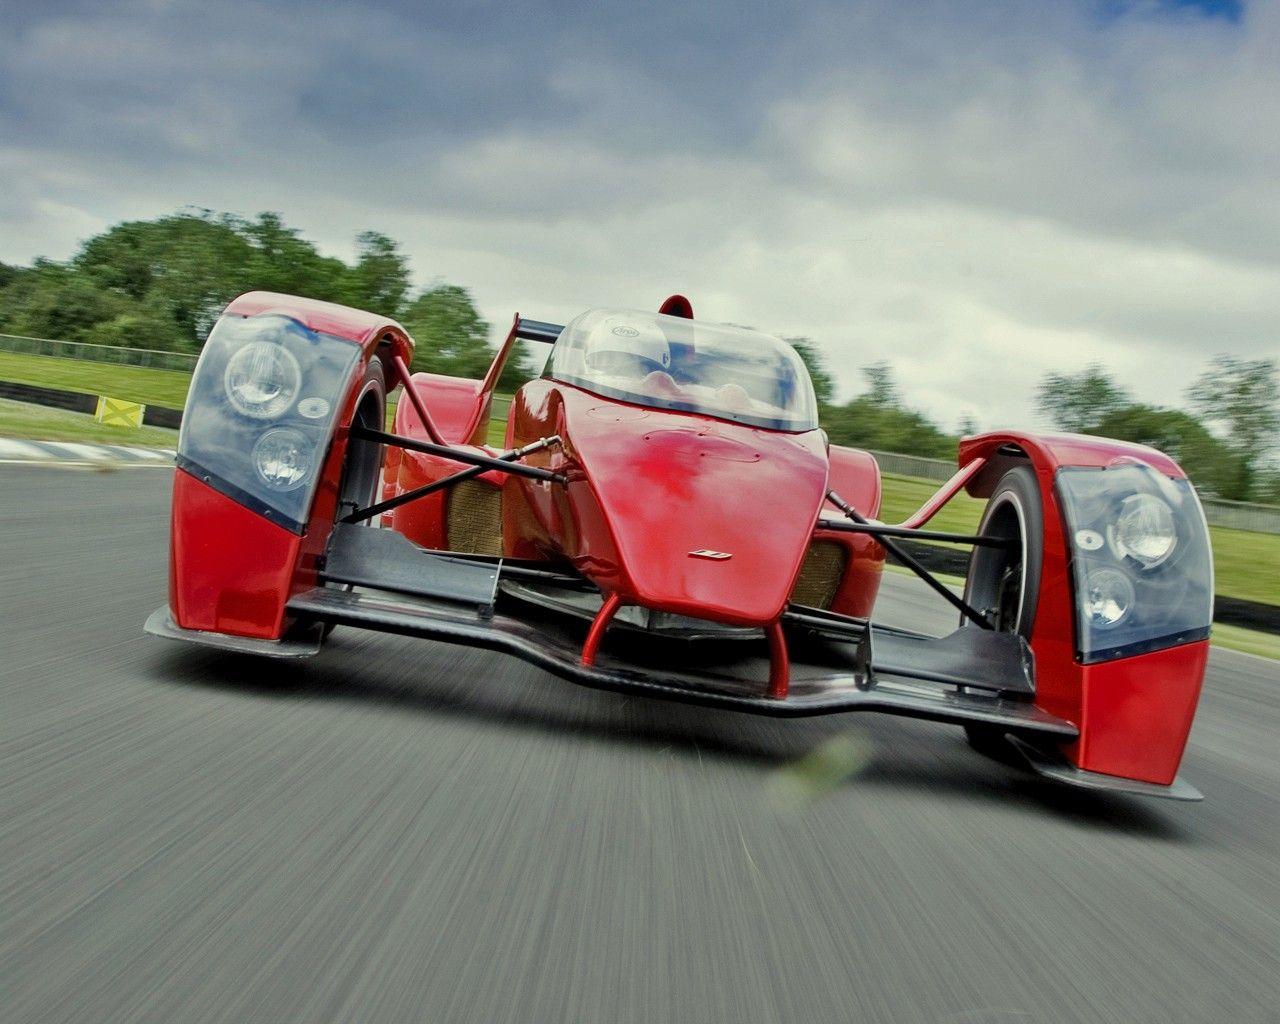 Обои автомобили, картинки машин, суперкары для